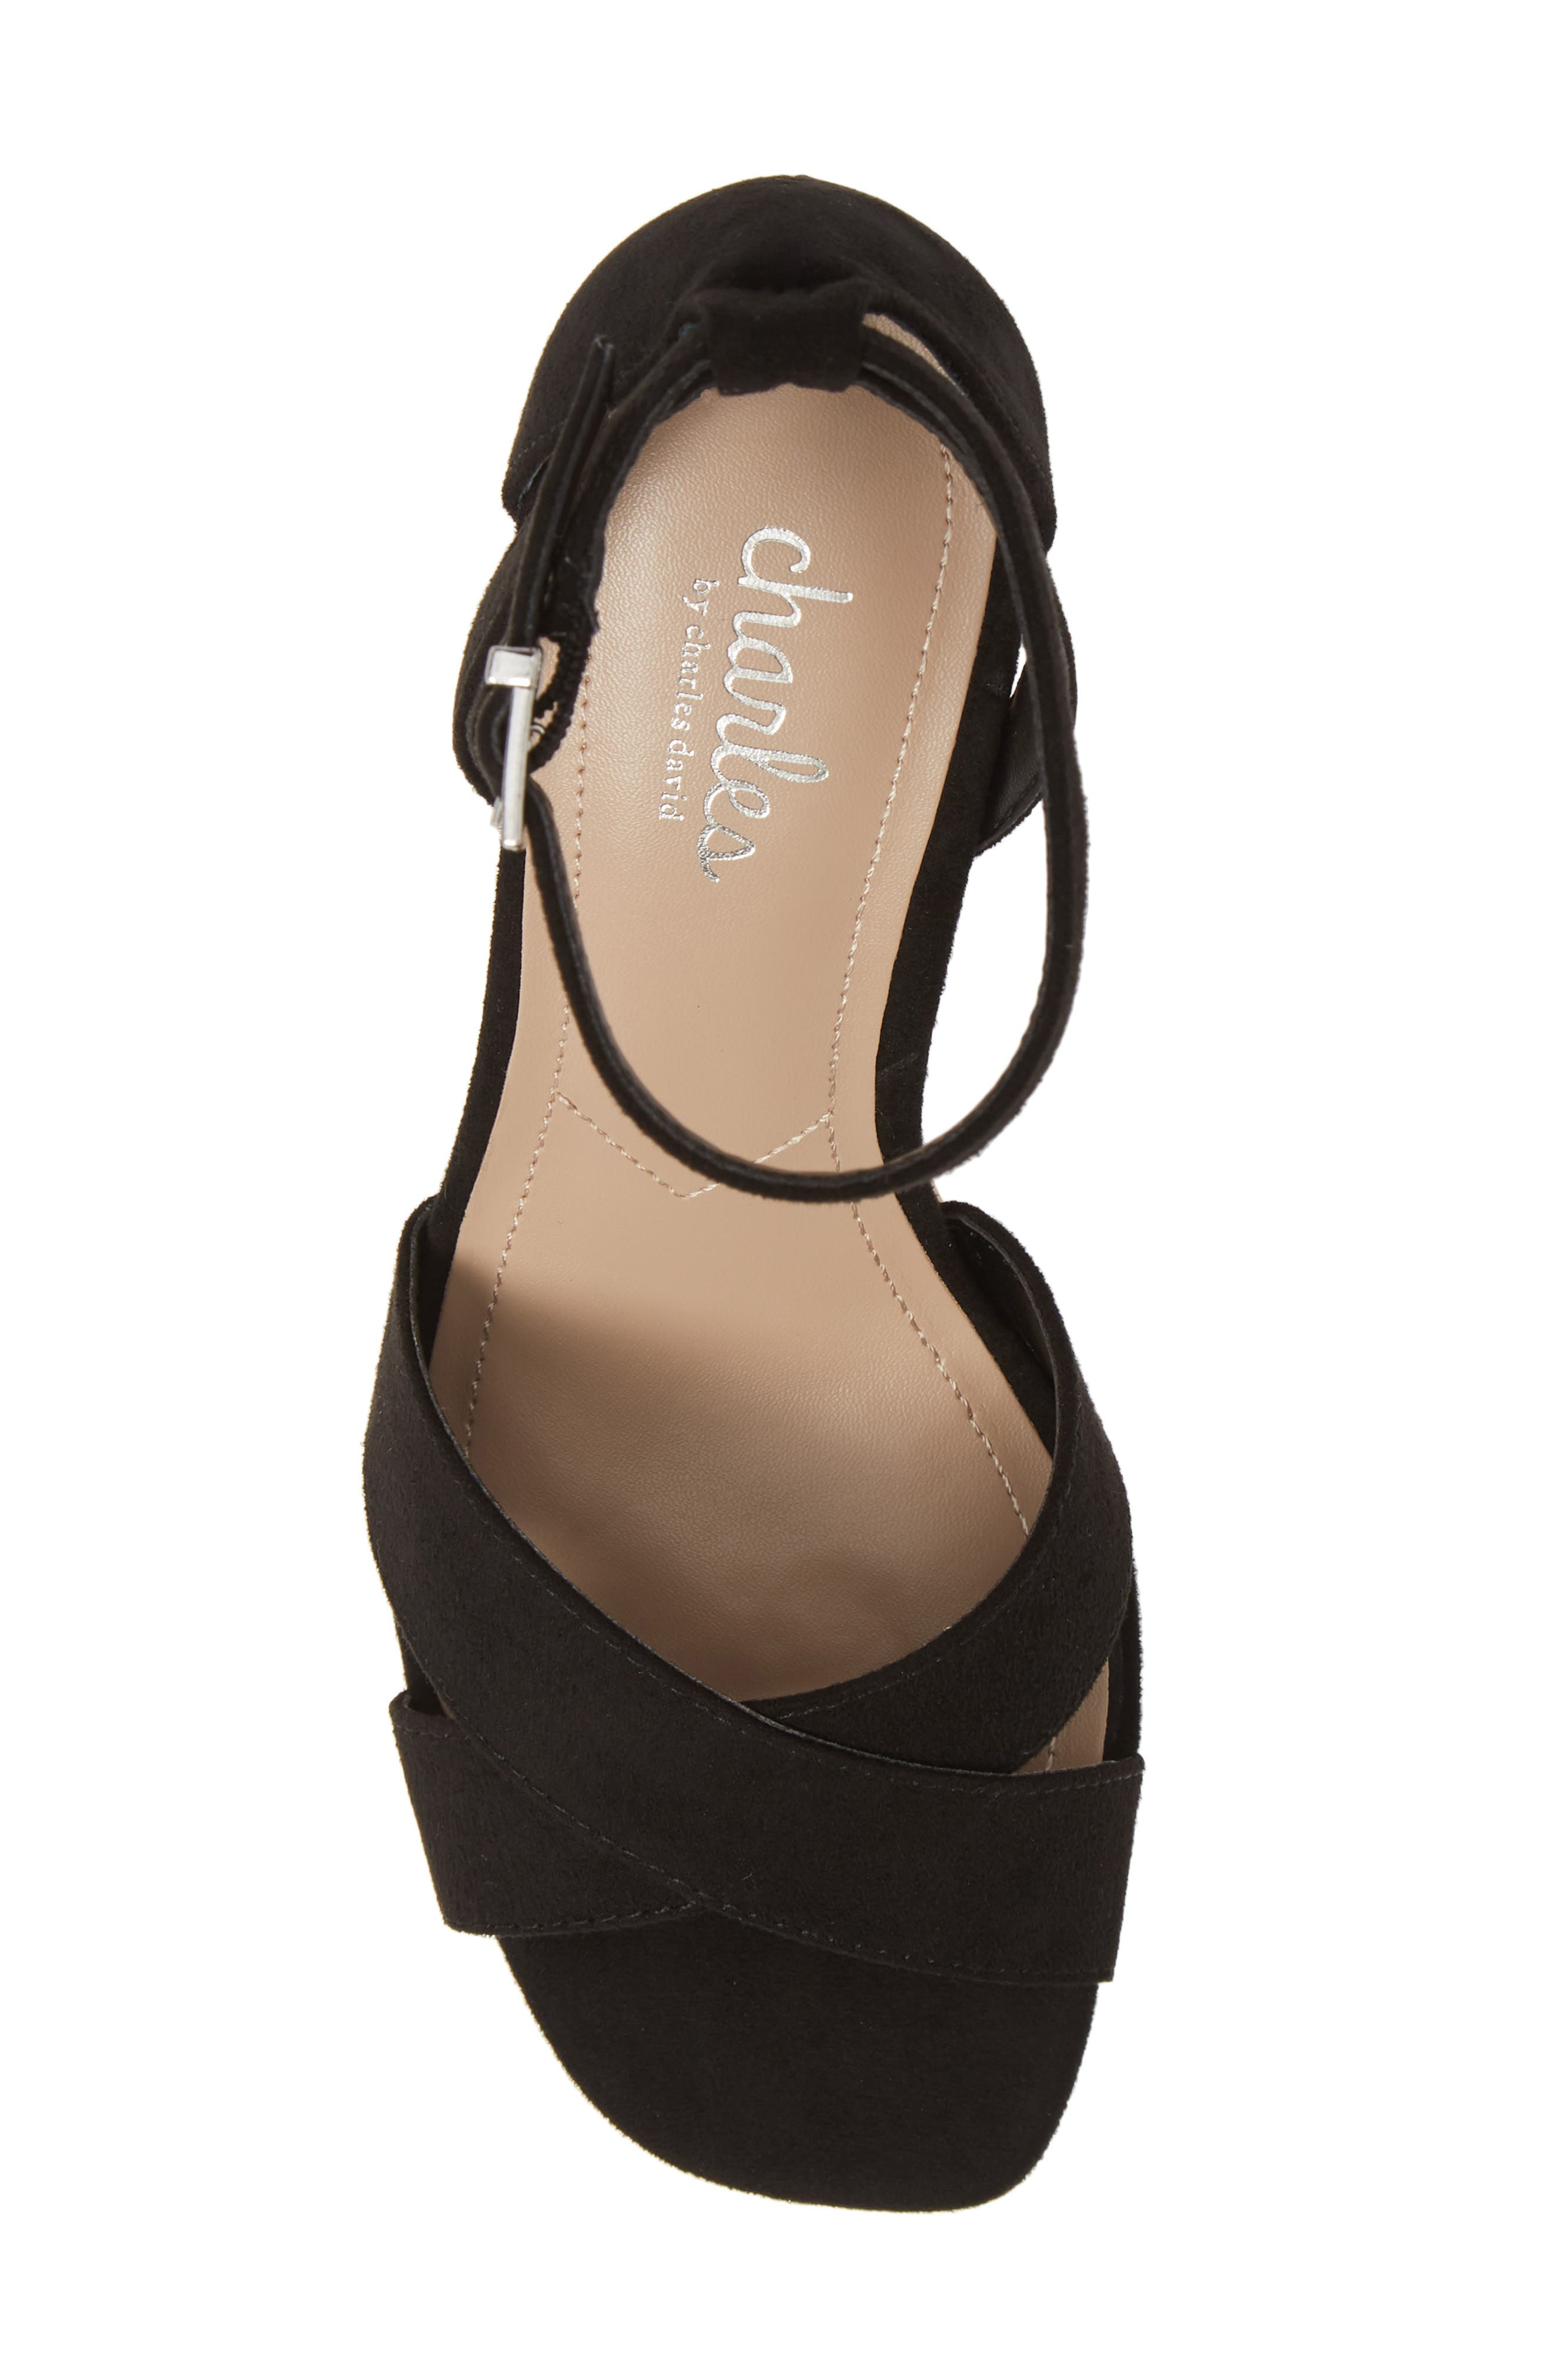 CHARLES BY CHARLES DAVID, Dempsey Platform Wedge Sandal, Alternate thumbnail 5, color, BLACK FABRIC